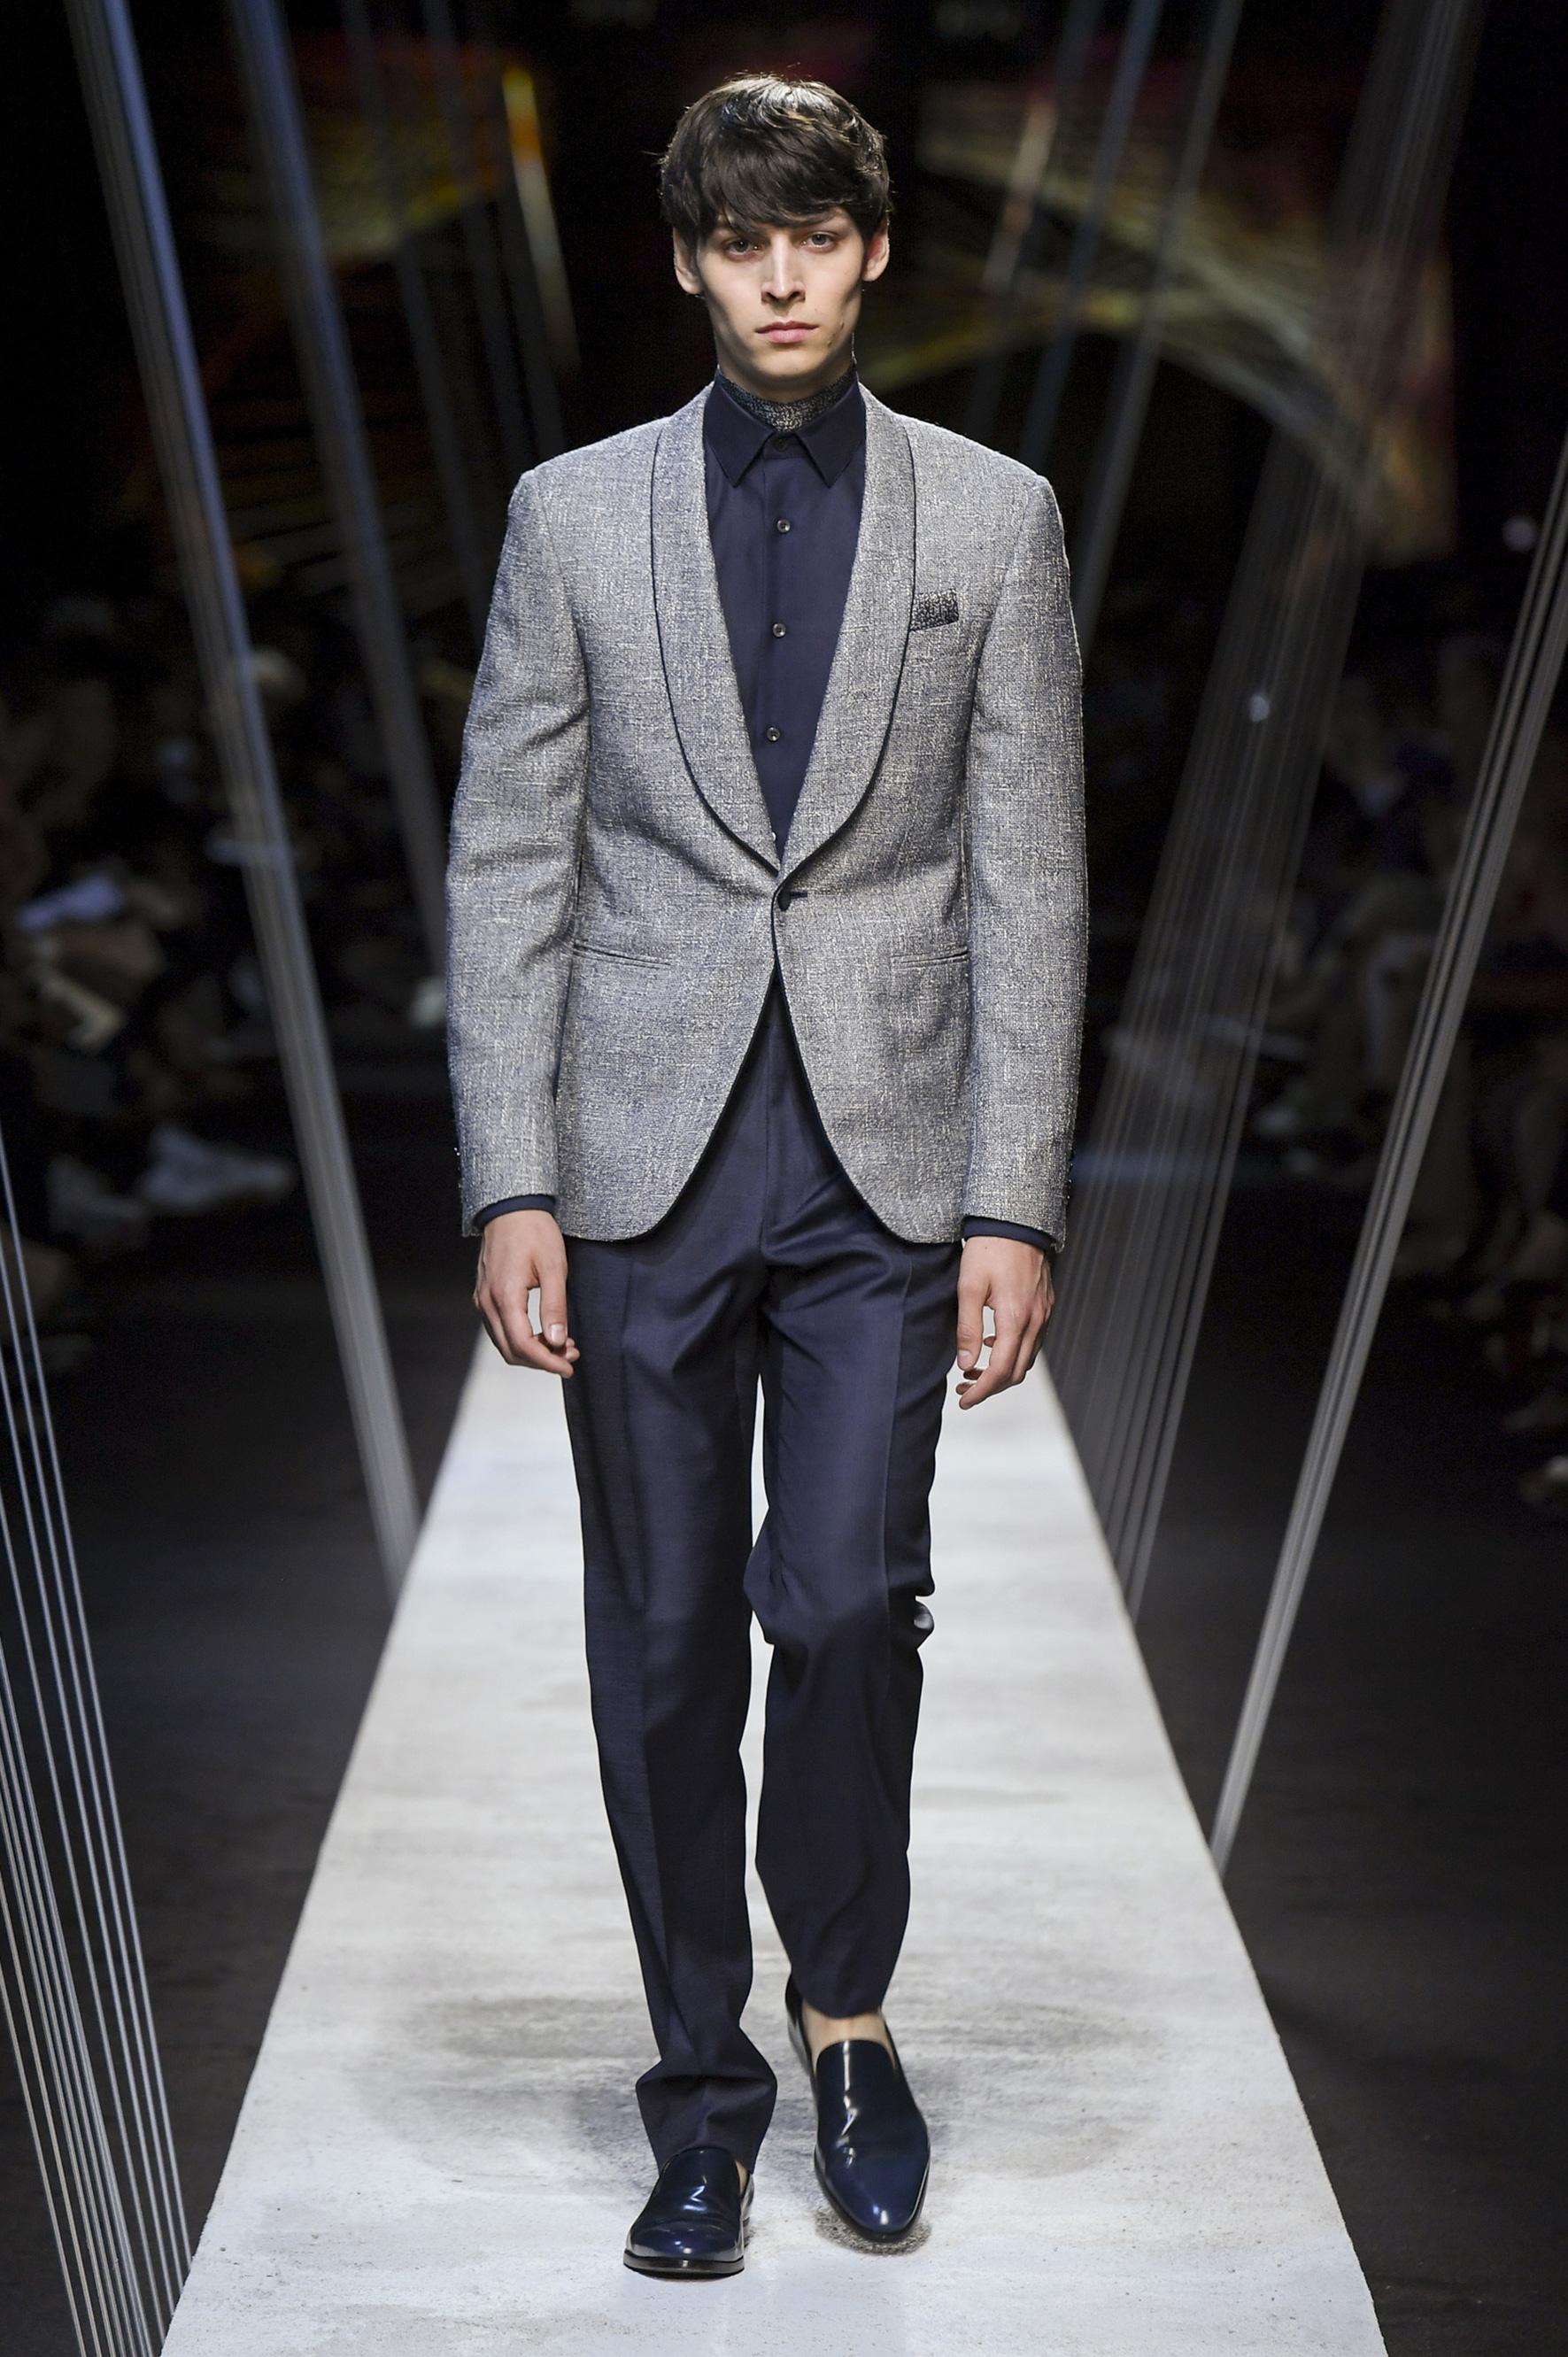 Canali-Solid-Grey-Tuxedo-Jkt